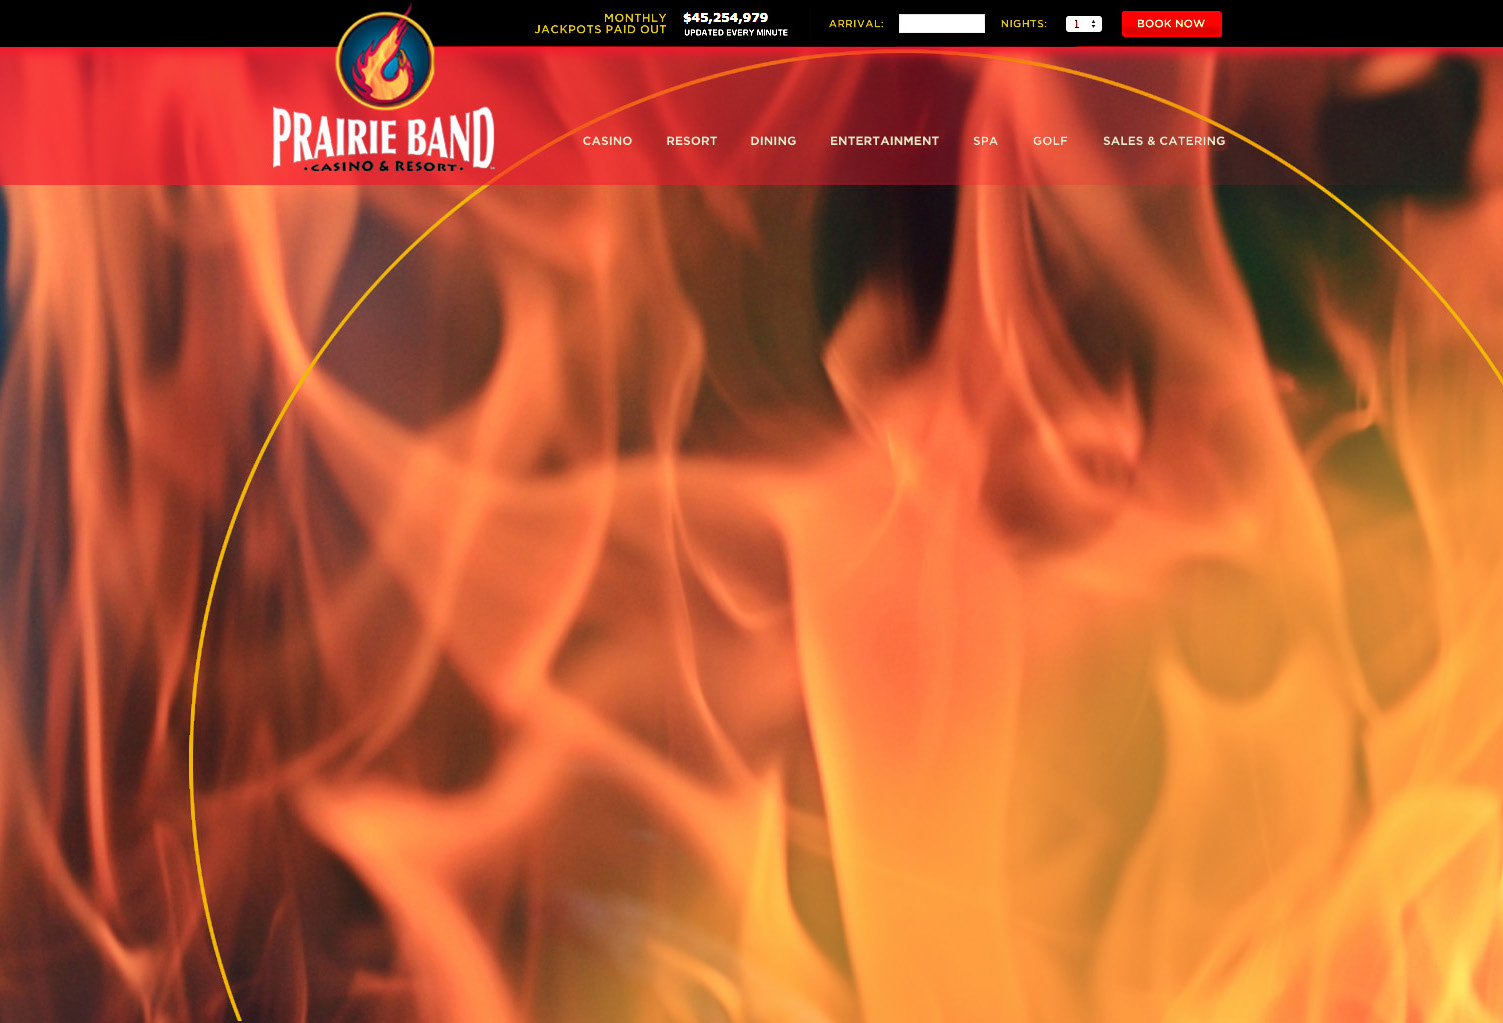 PrairieBandwww1.jpg